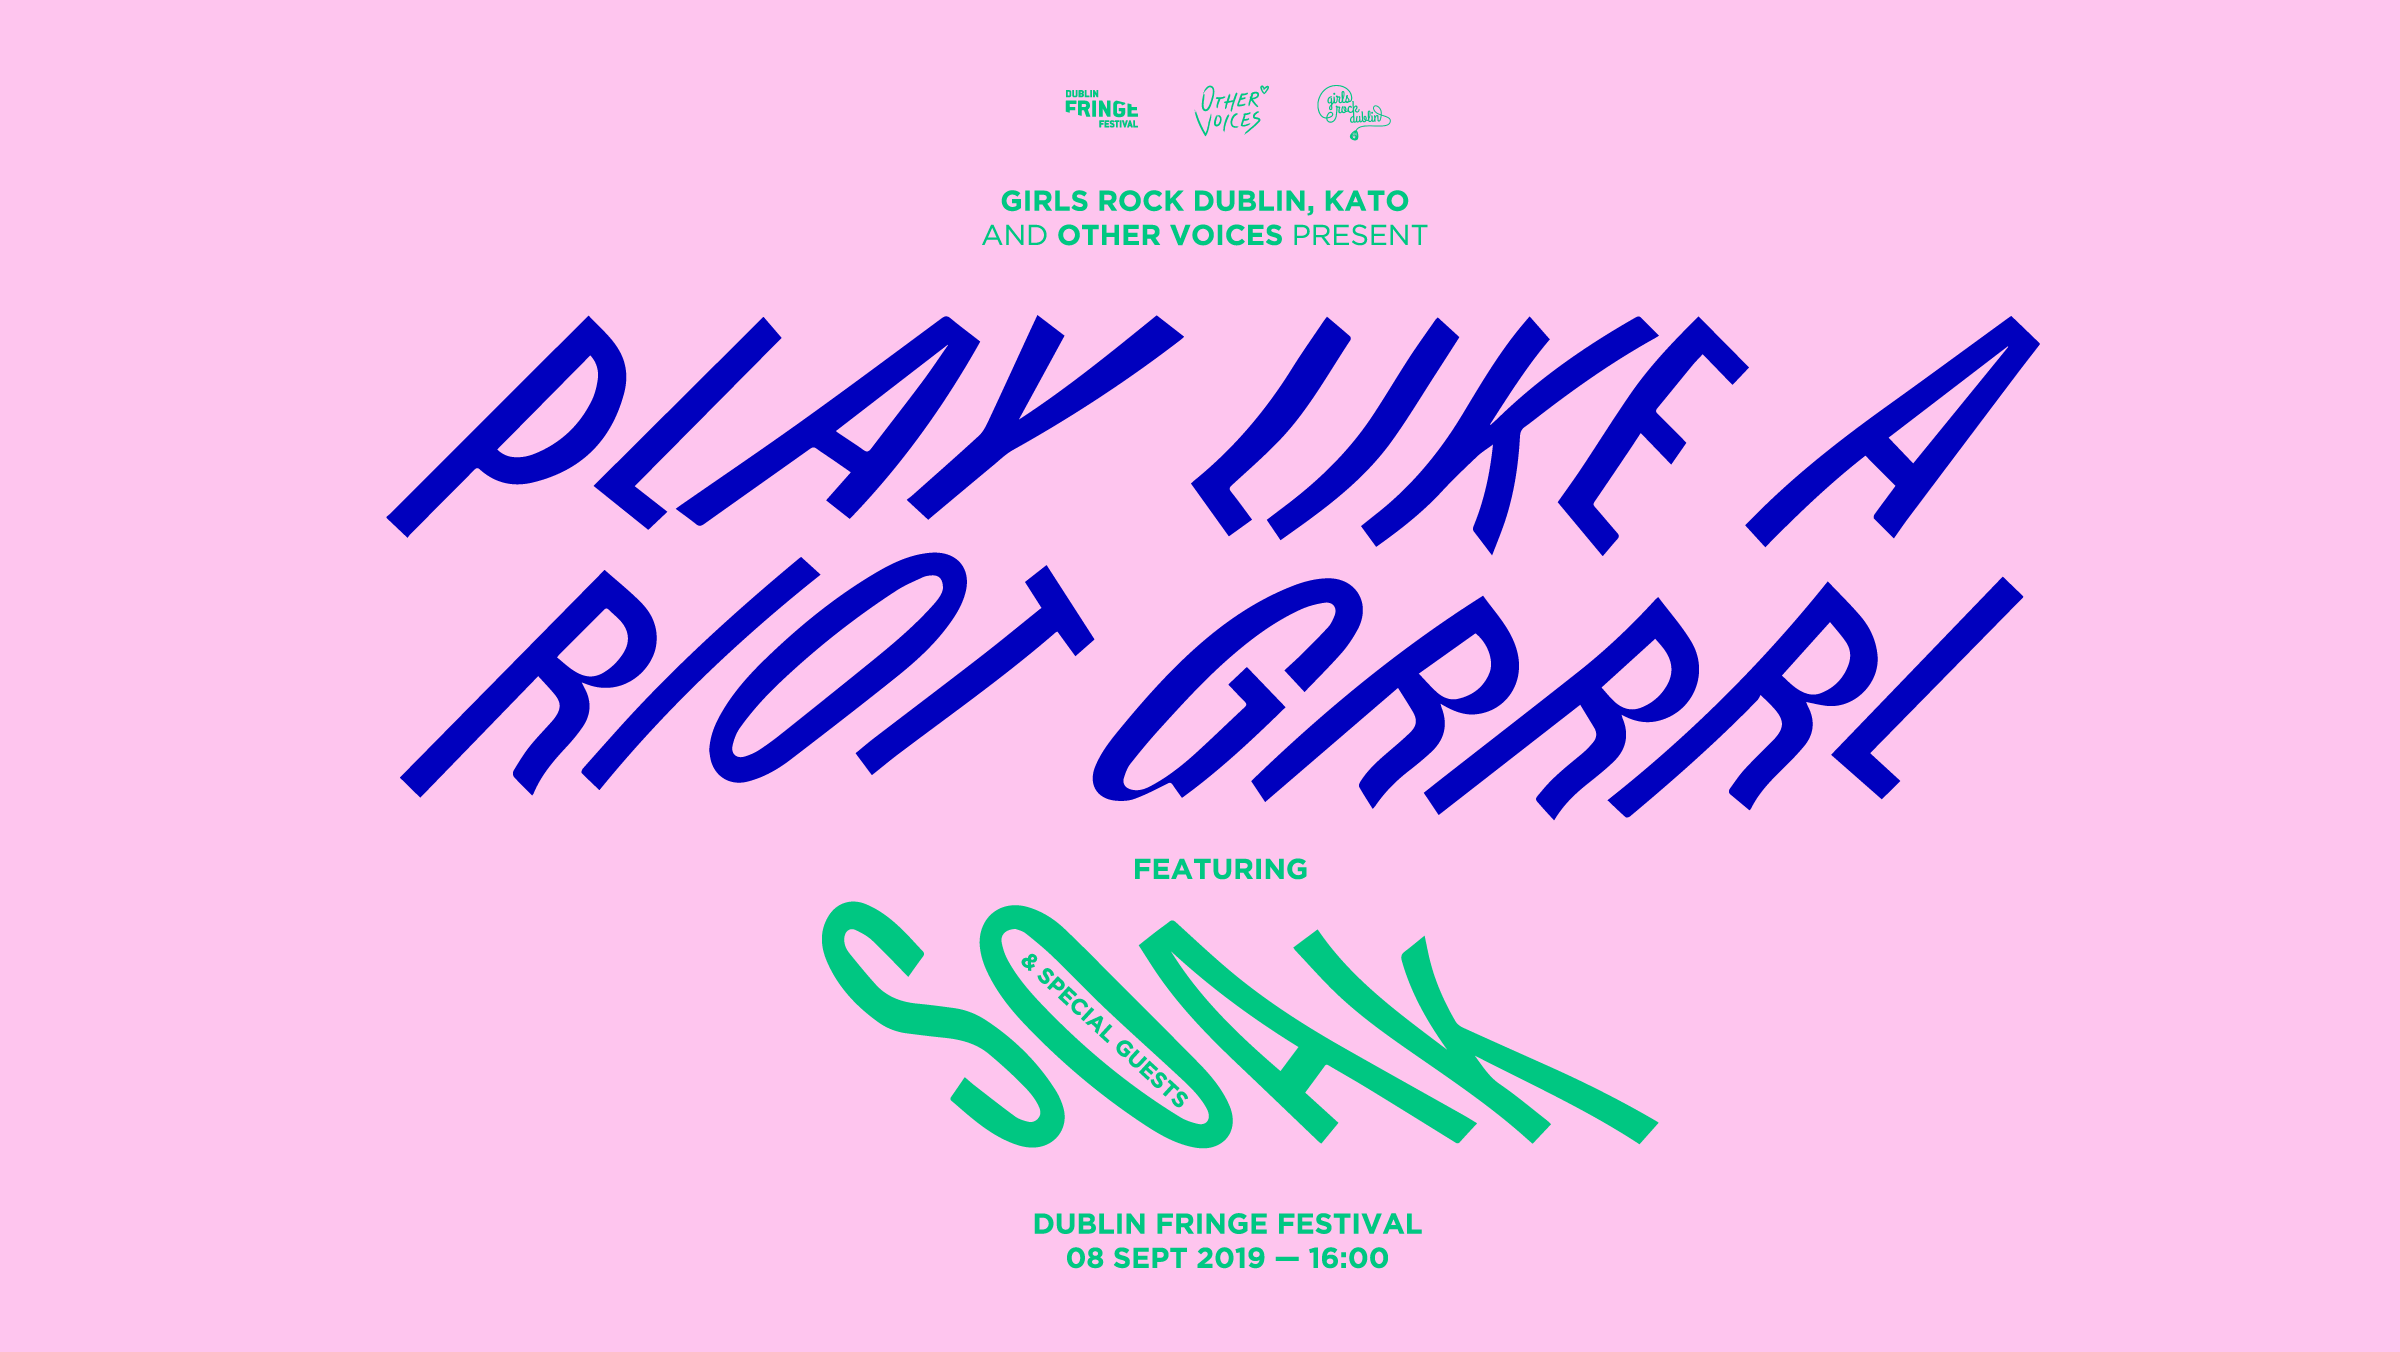 Play Like A Riot Grrrl featuring SOAK